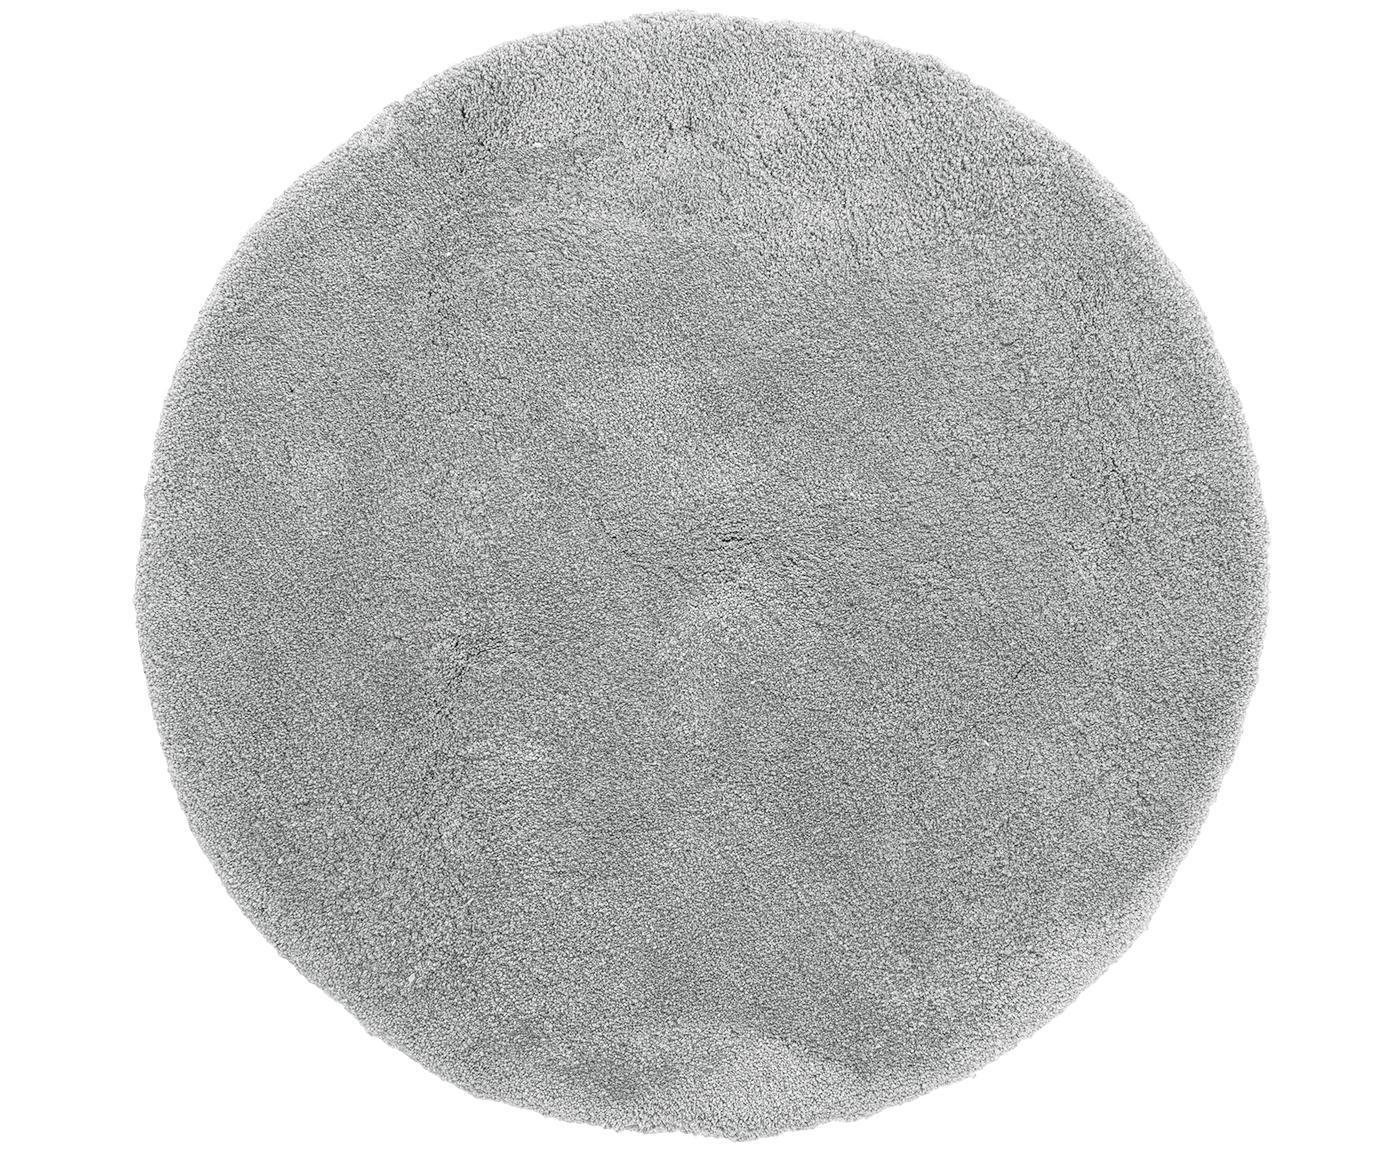 Rond hoogpolig vloerkleed Leighton in donkergrijs, Donkergrijs, Ø 120 cm